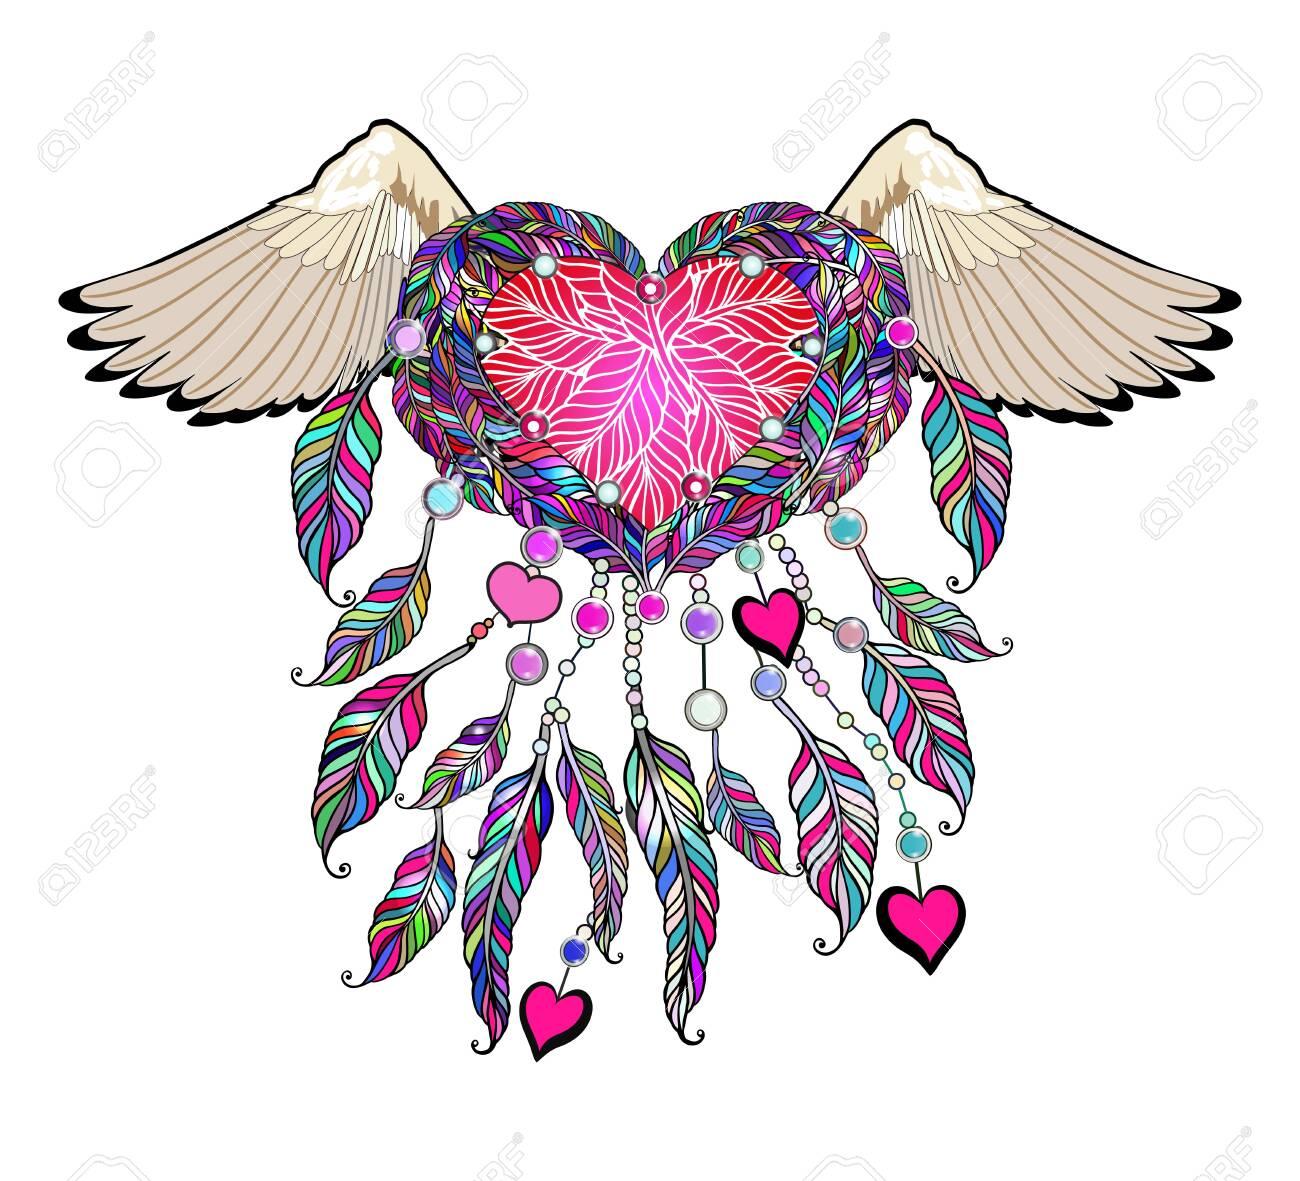 Ethnic apparel illustration - tribal amulet. - 124544902